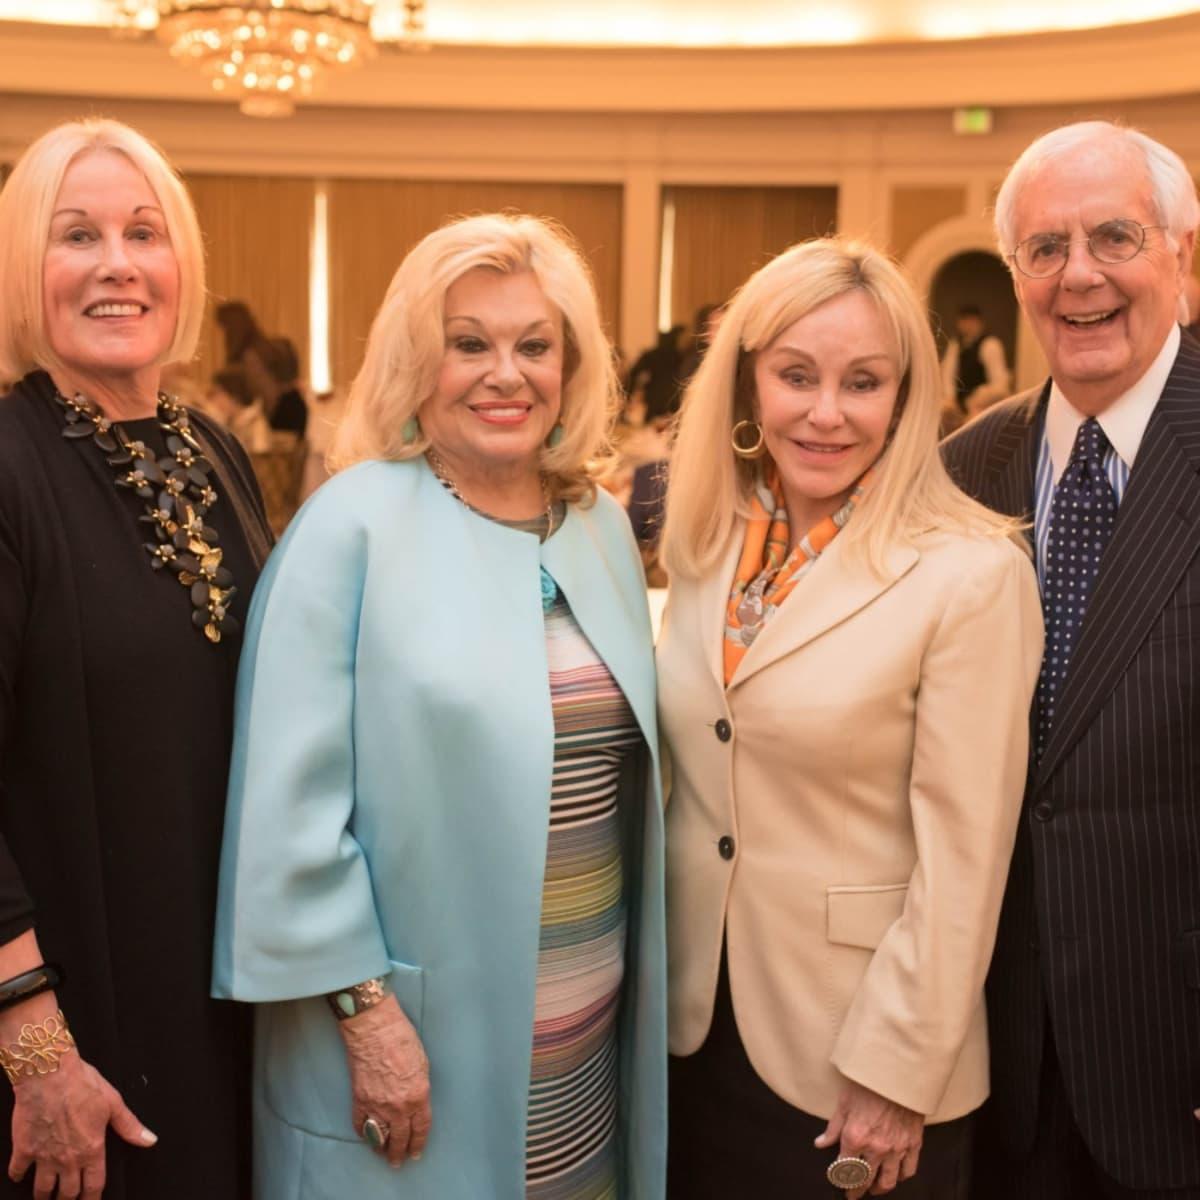 Houston, TCH Celebration of Champions, February 2018, Elsie Eckert, Sidney Faust, Judi McGee, Scott Basinger